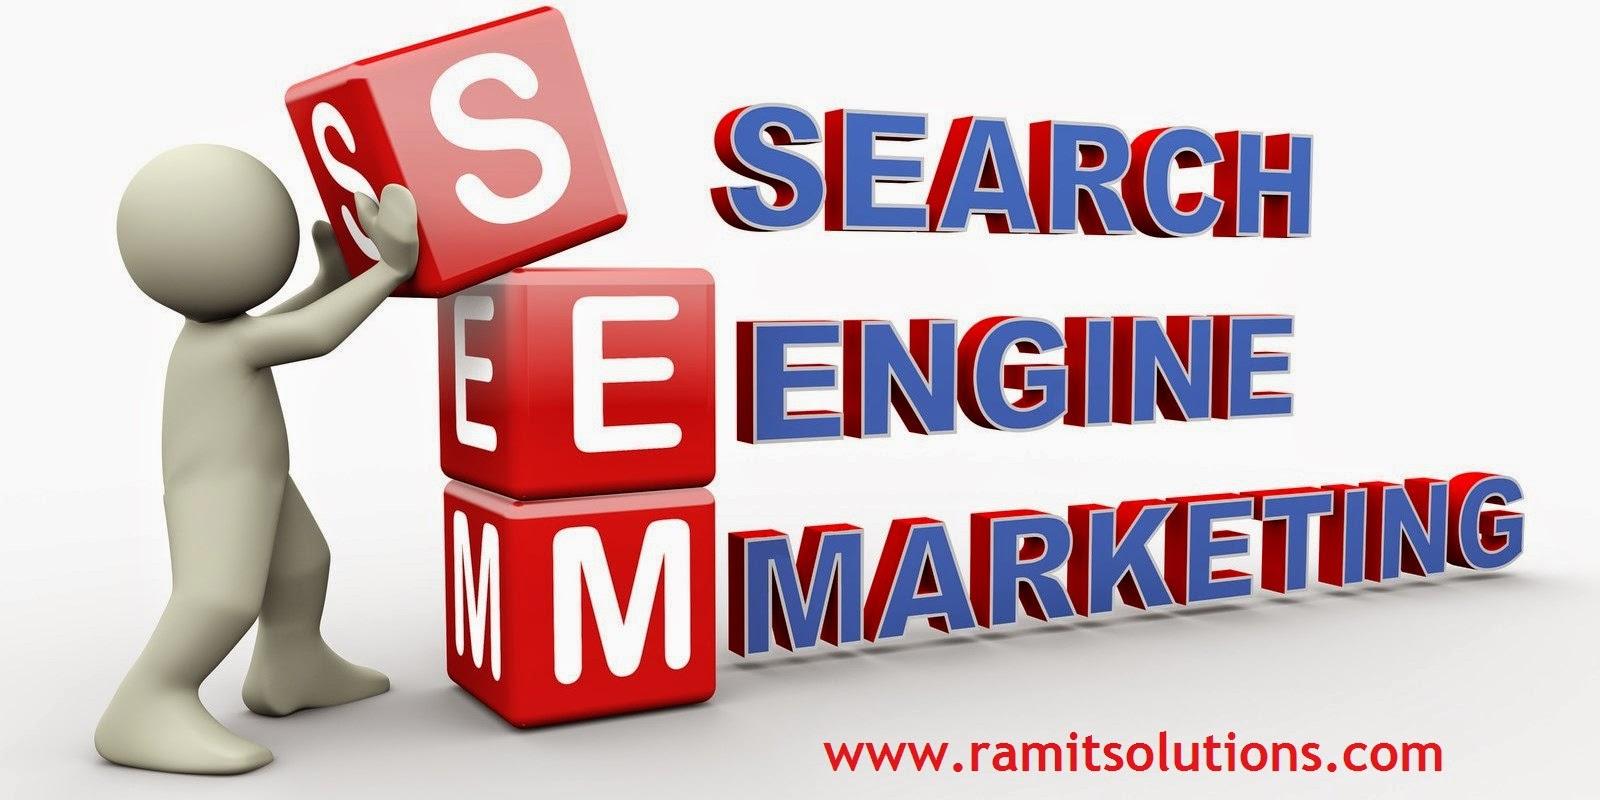 Search Engine Marketing | Search Engine Marketing Trianing